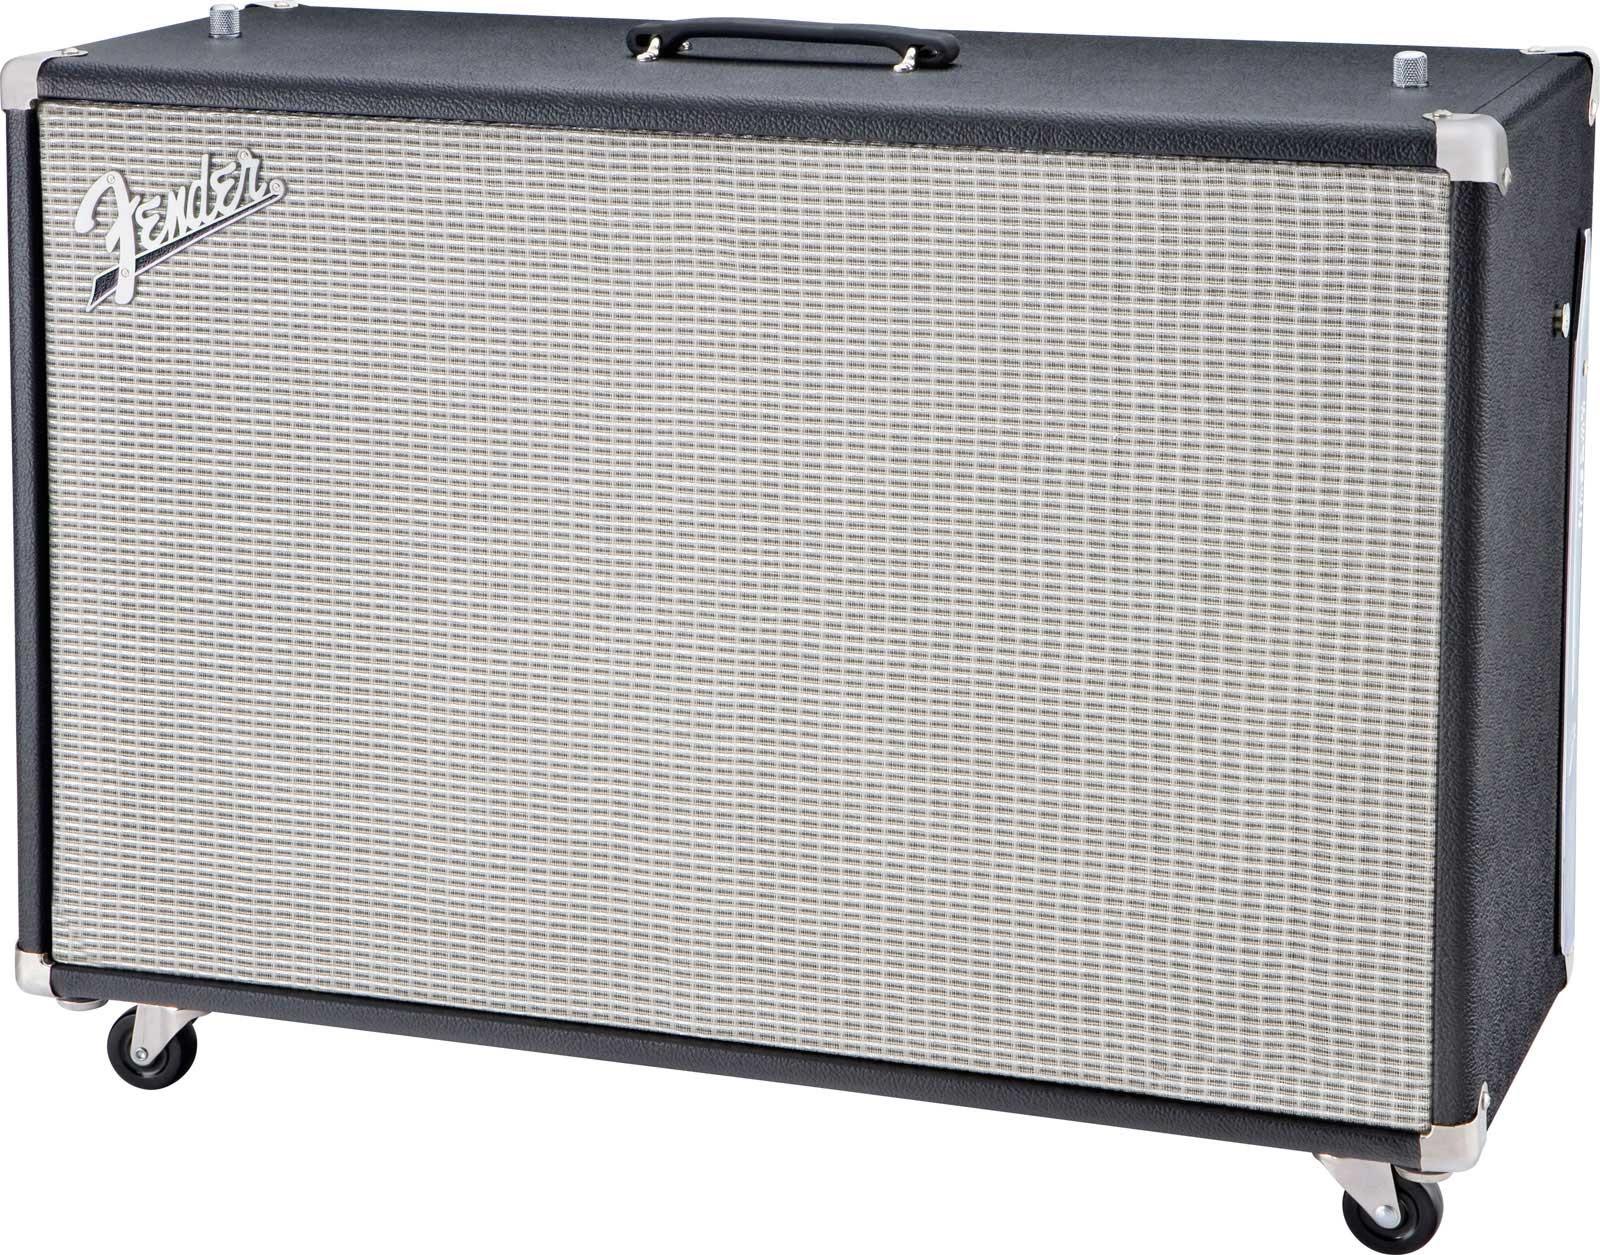 Fender Super-Sonic 60 2x12 Enclosure Black